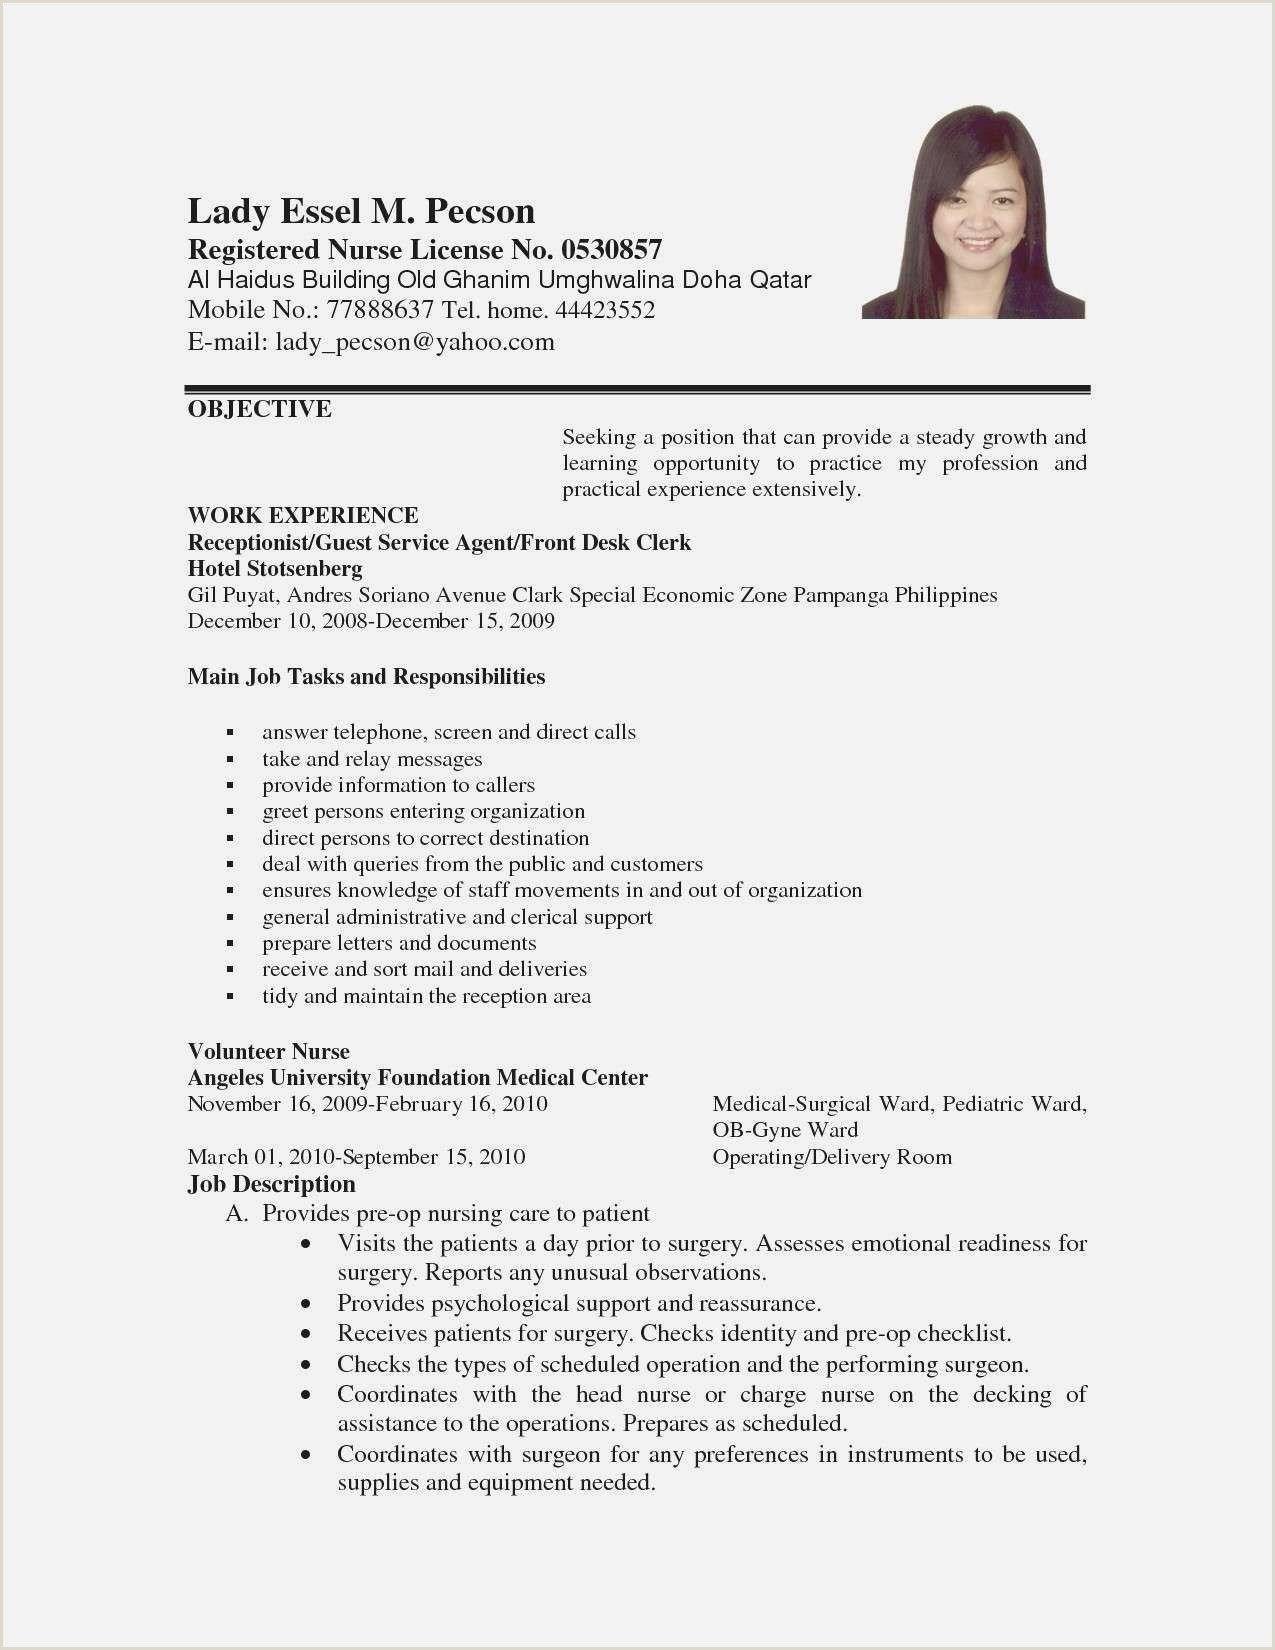 Europass Cv format 2019 in 2020 Job resume format, Basic